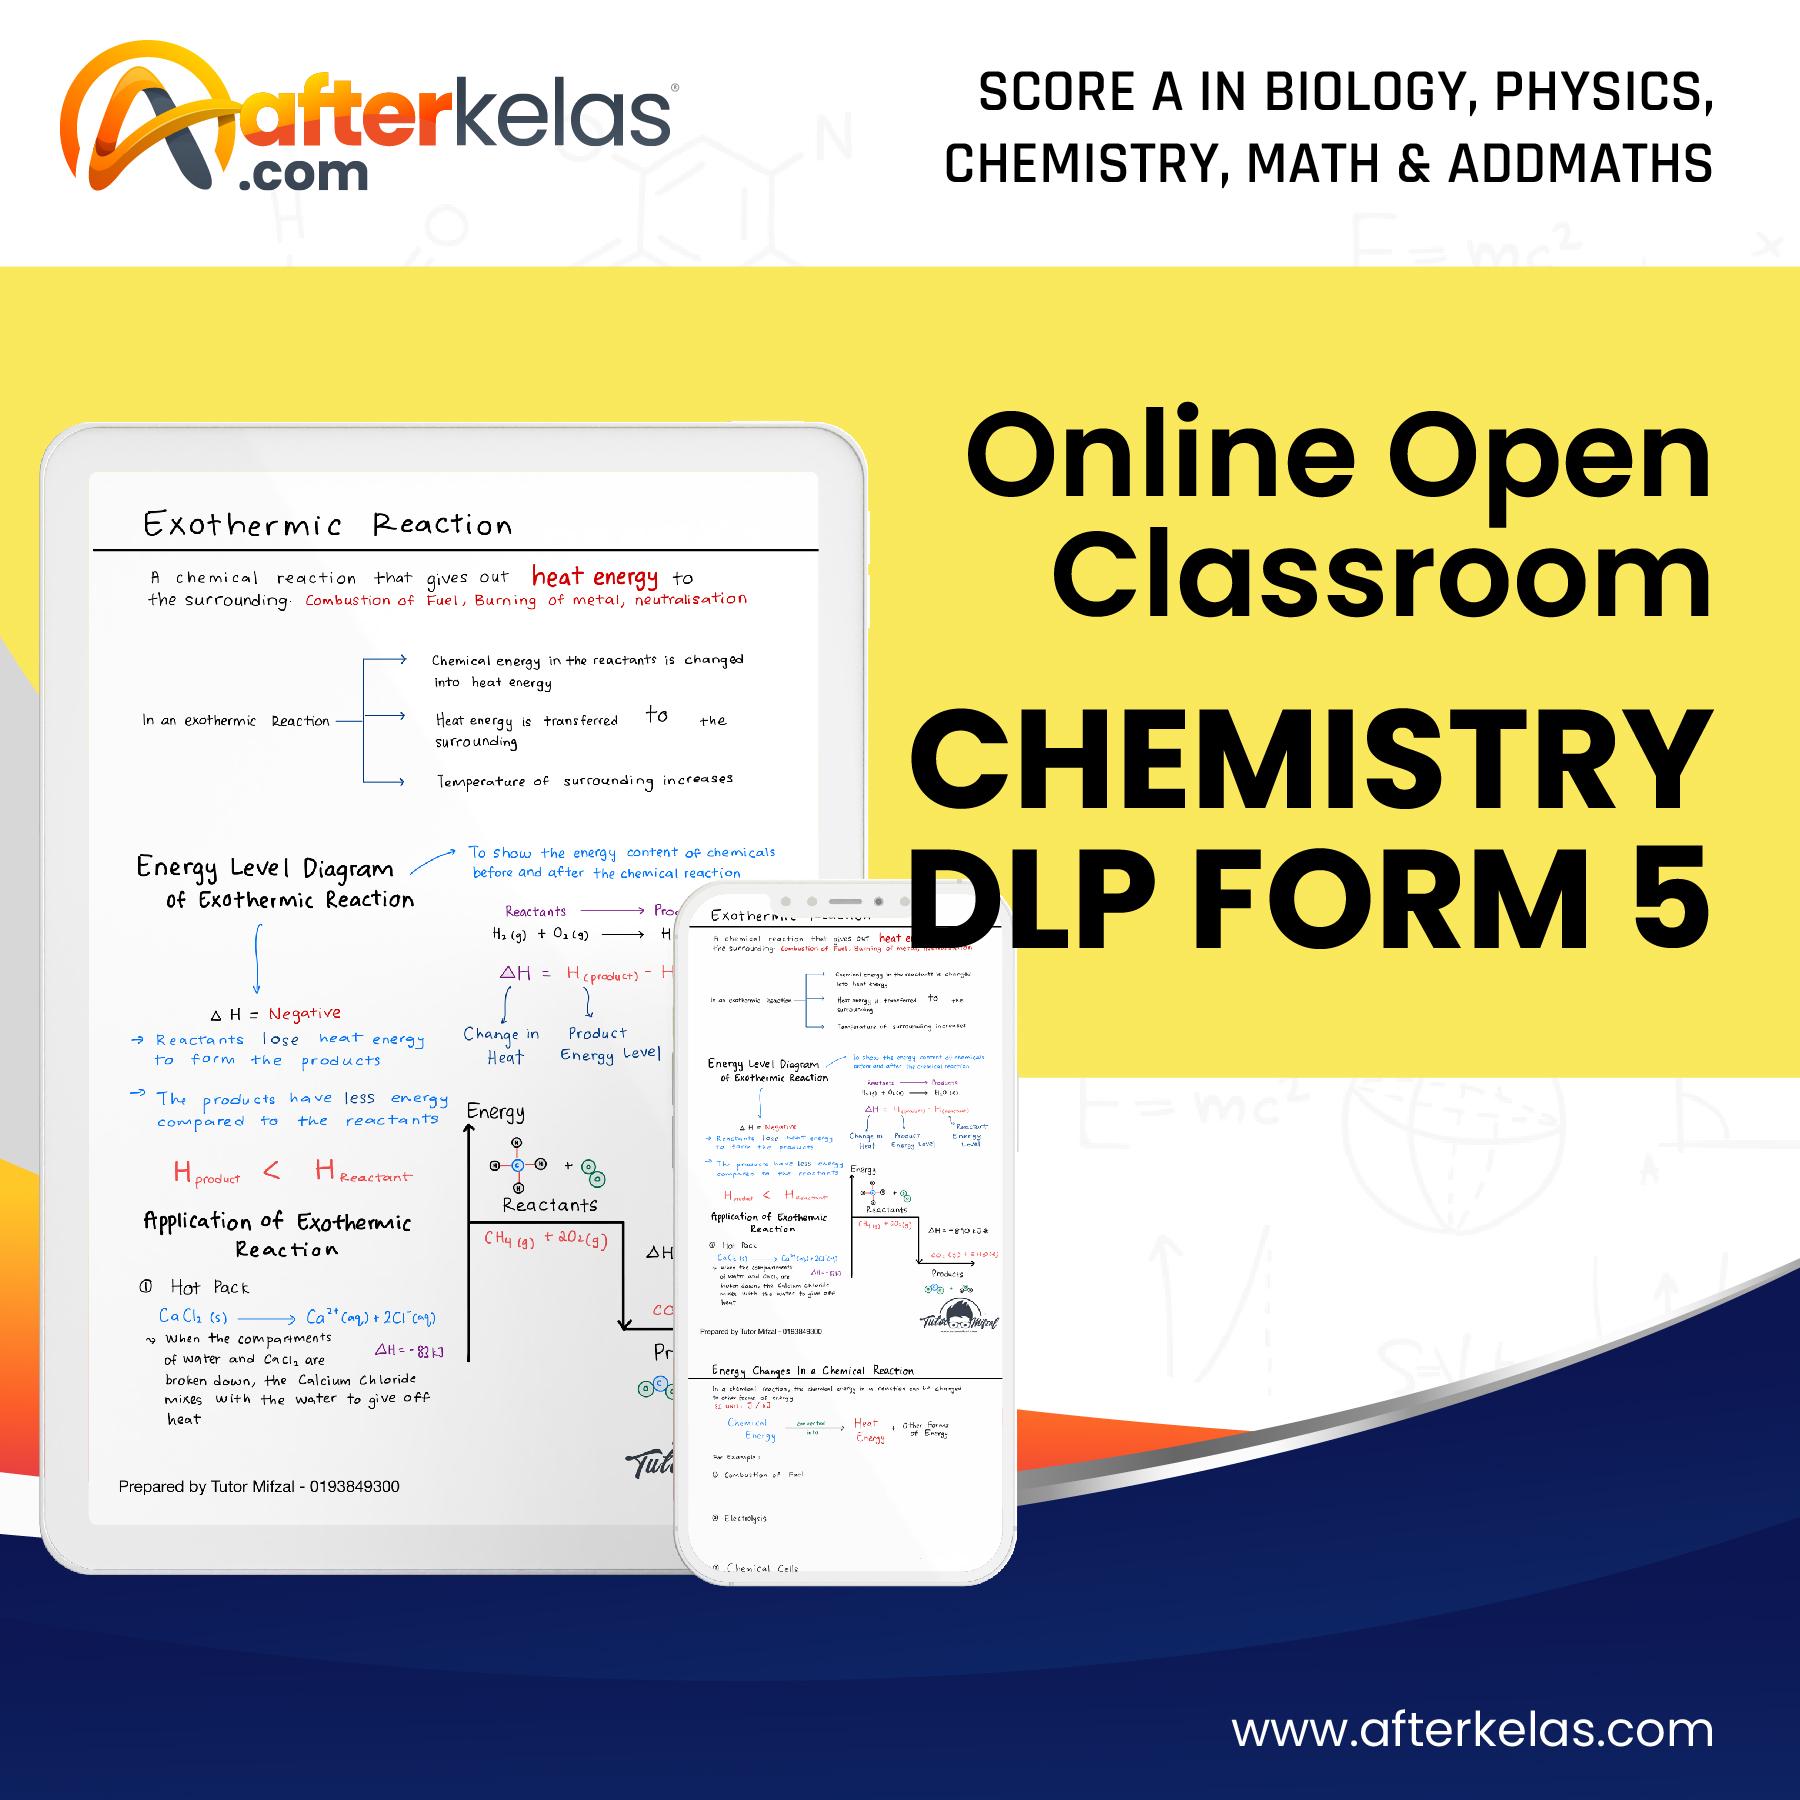 f5 chemistry dlp